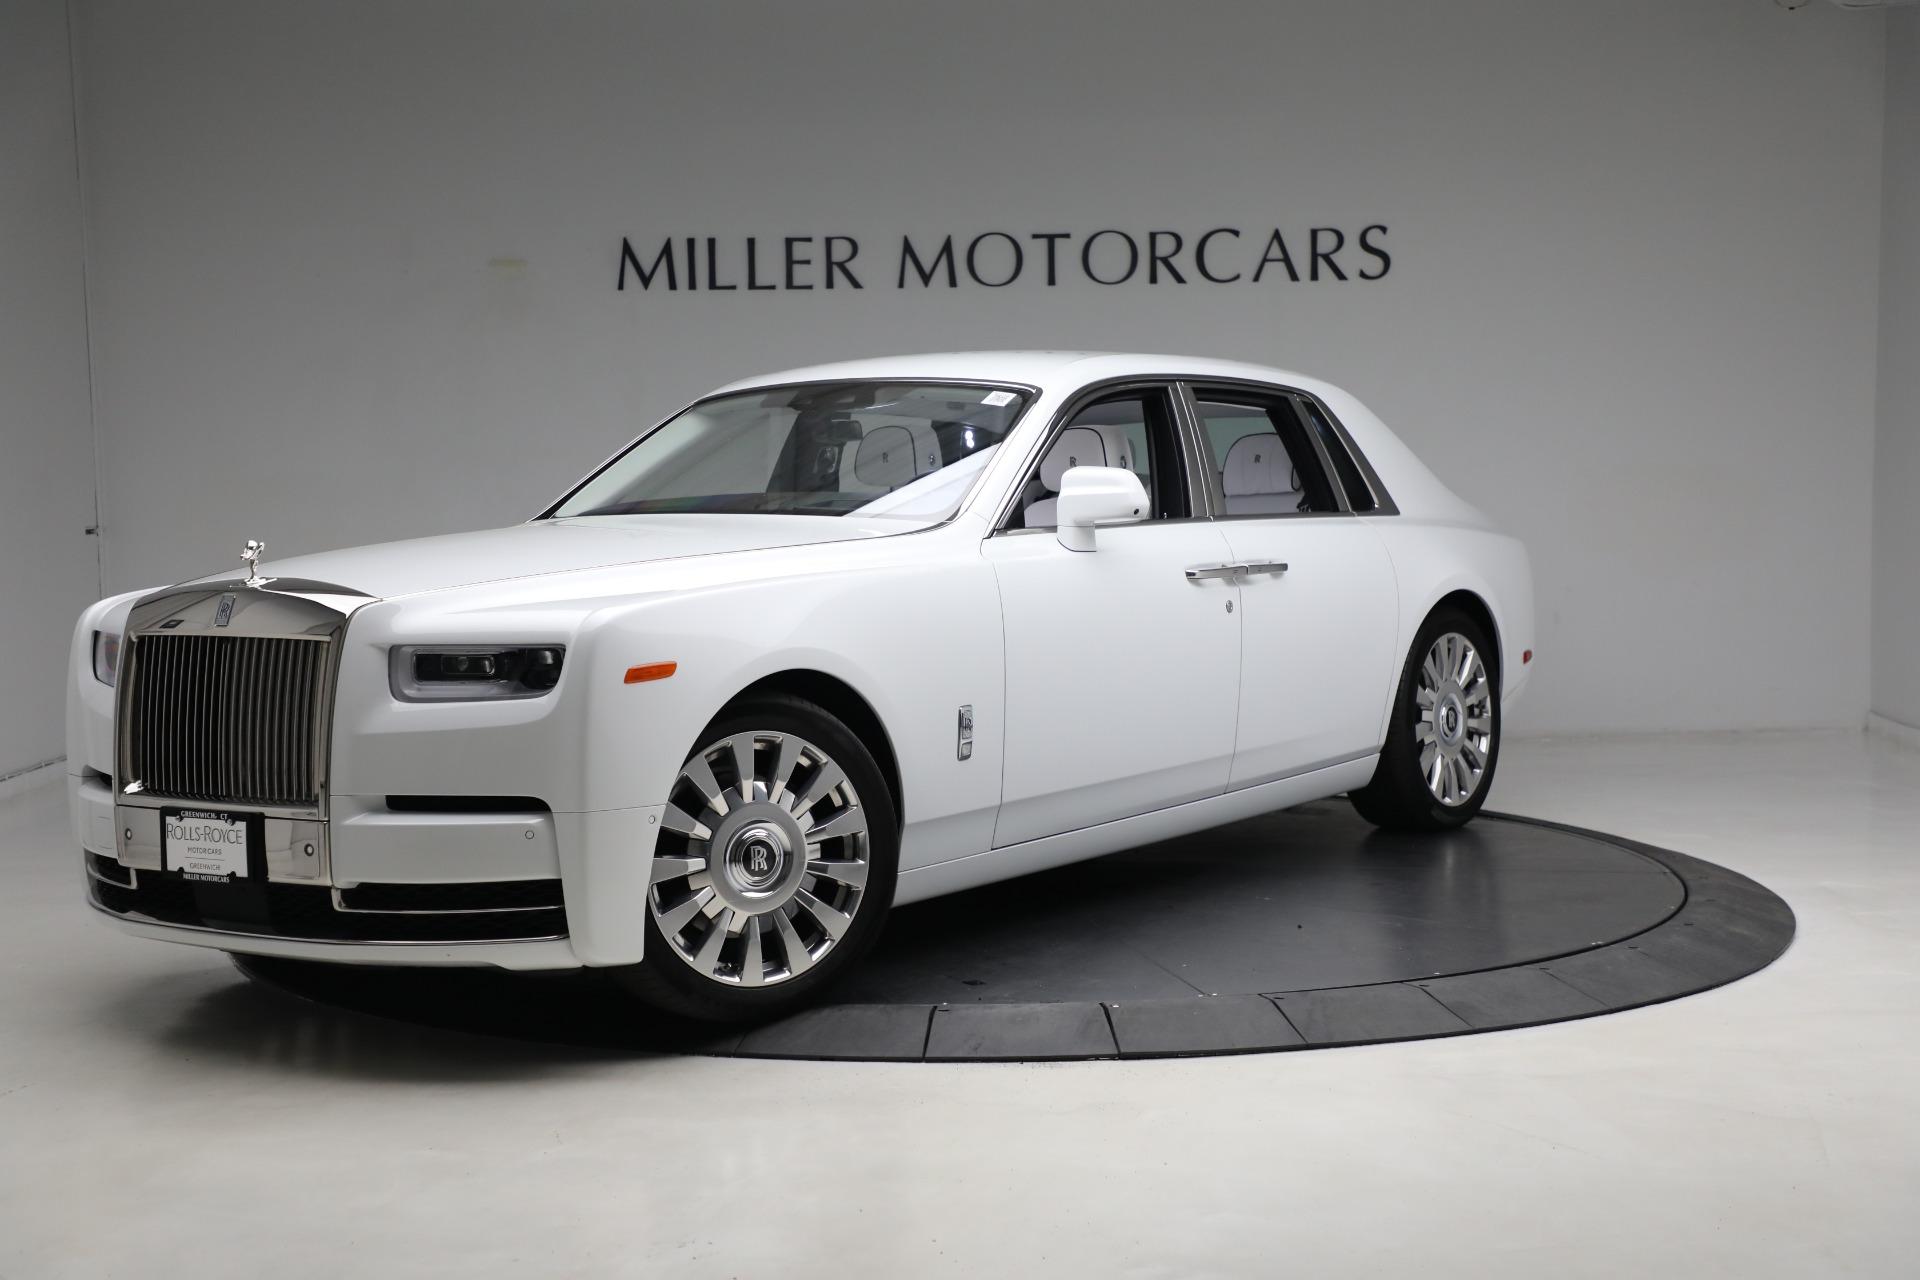 New 2020 Rolls-Royce Phantom for sale $545,200 at Rolls-Royce Motor Cars Greenwich in Greenwich CT 06830 1